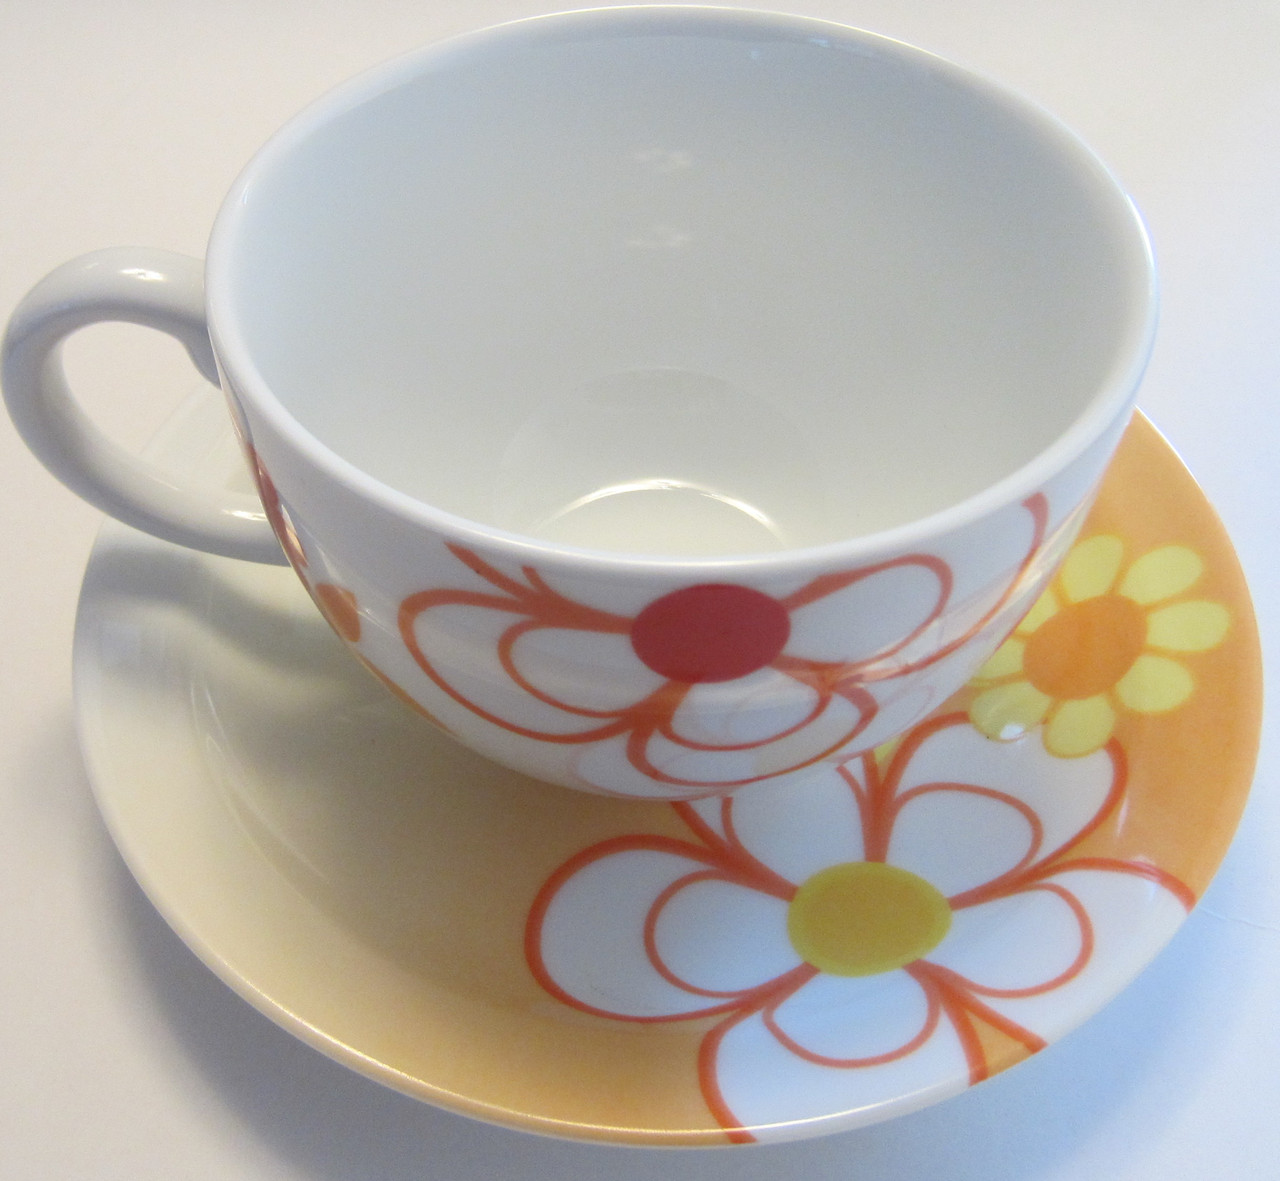 Набор чашек с блюдцами для завтрака Allure Оазис